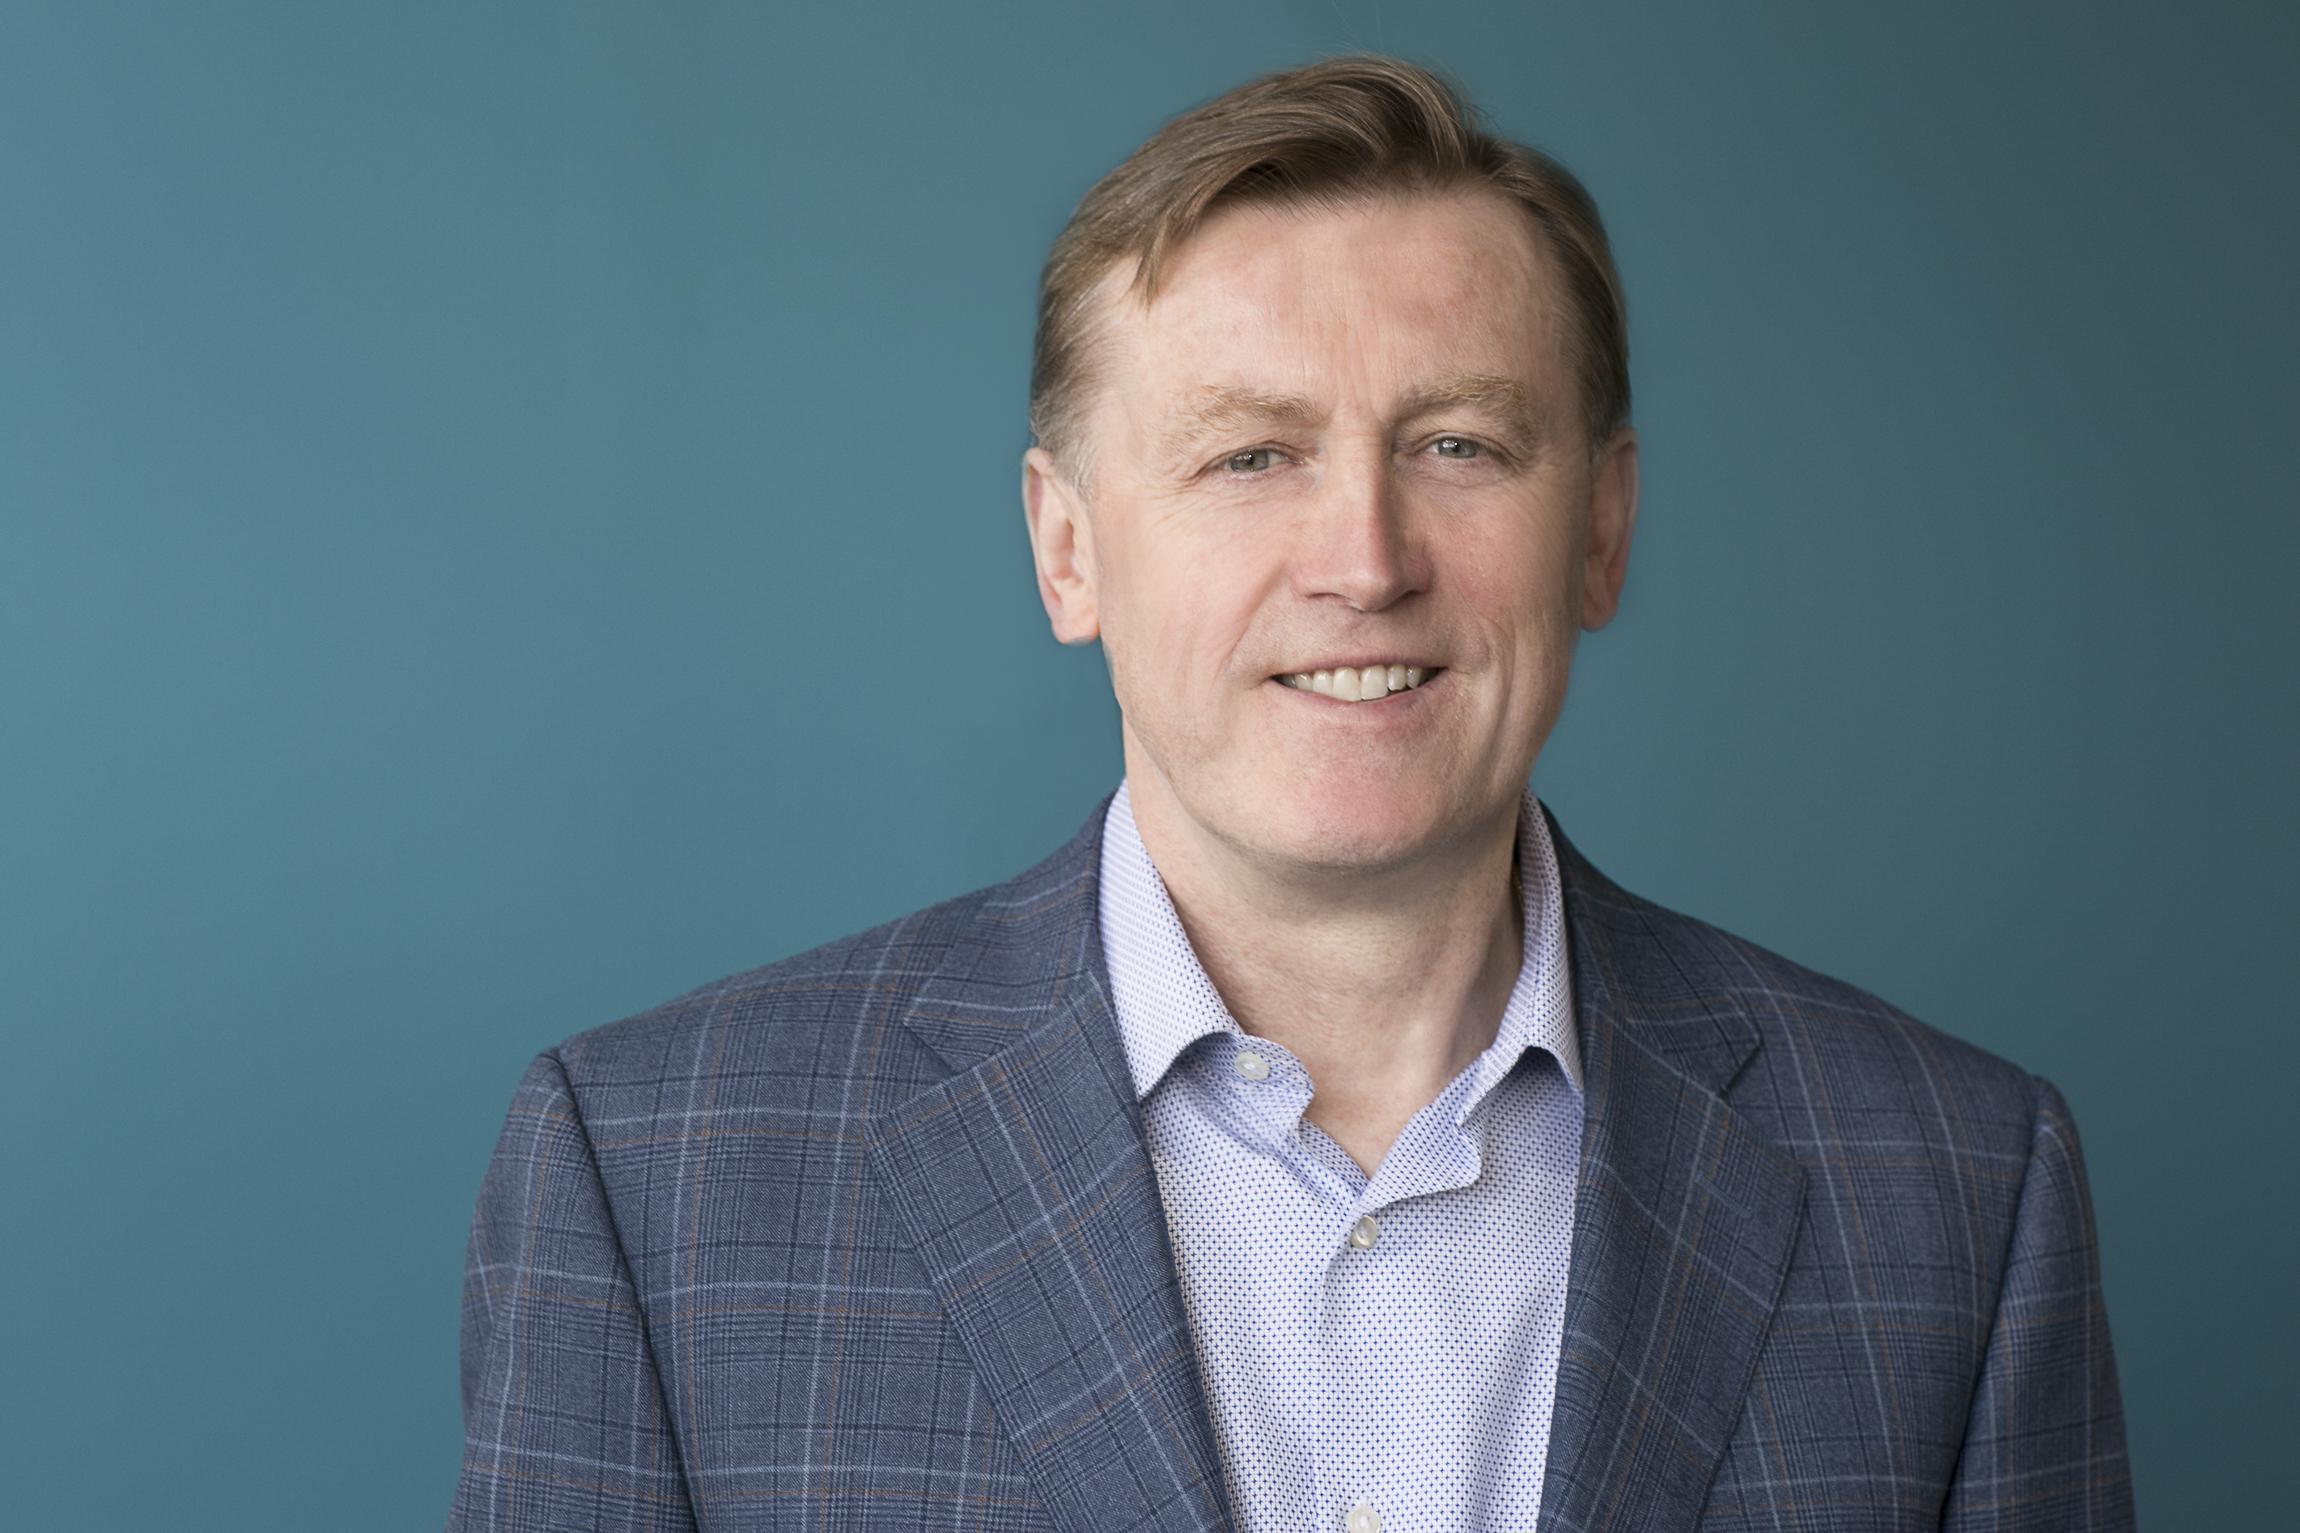 ADI公司总裁兼首席执行官Vincent Roche:那些将在2019年改变我们生活的技术